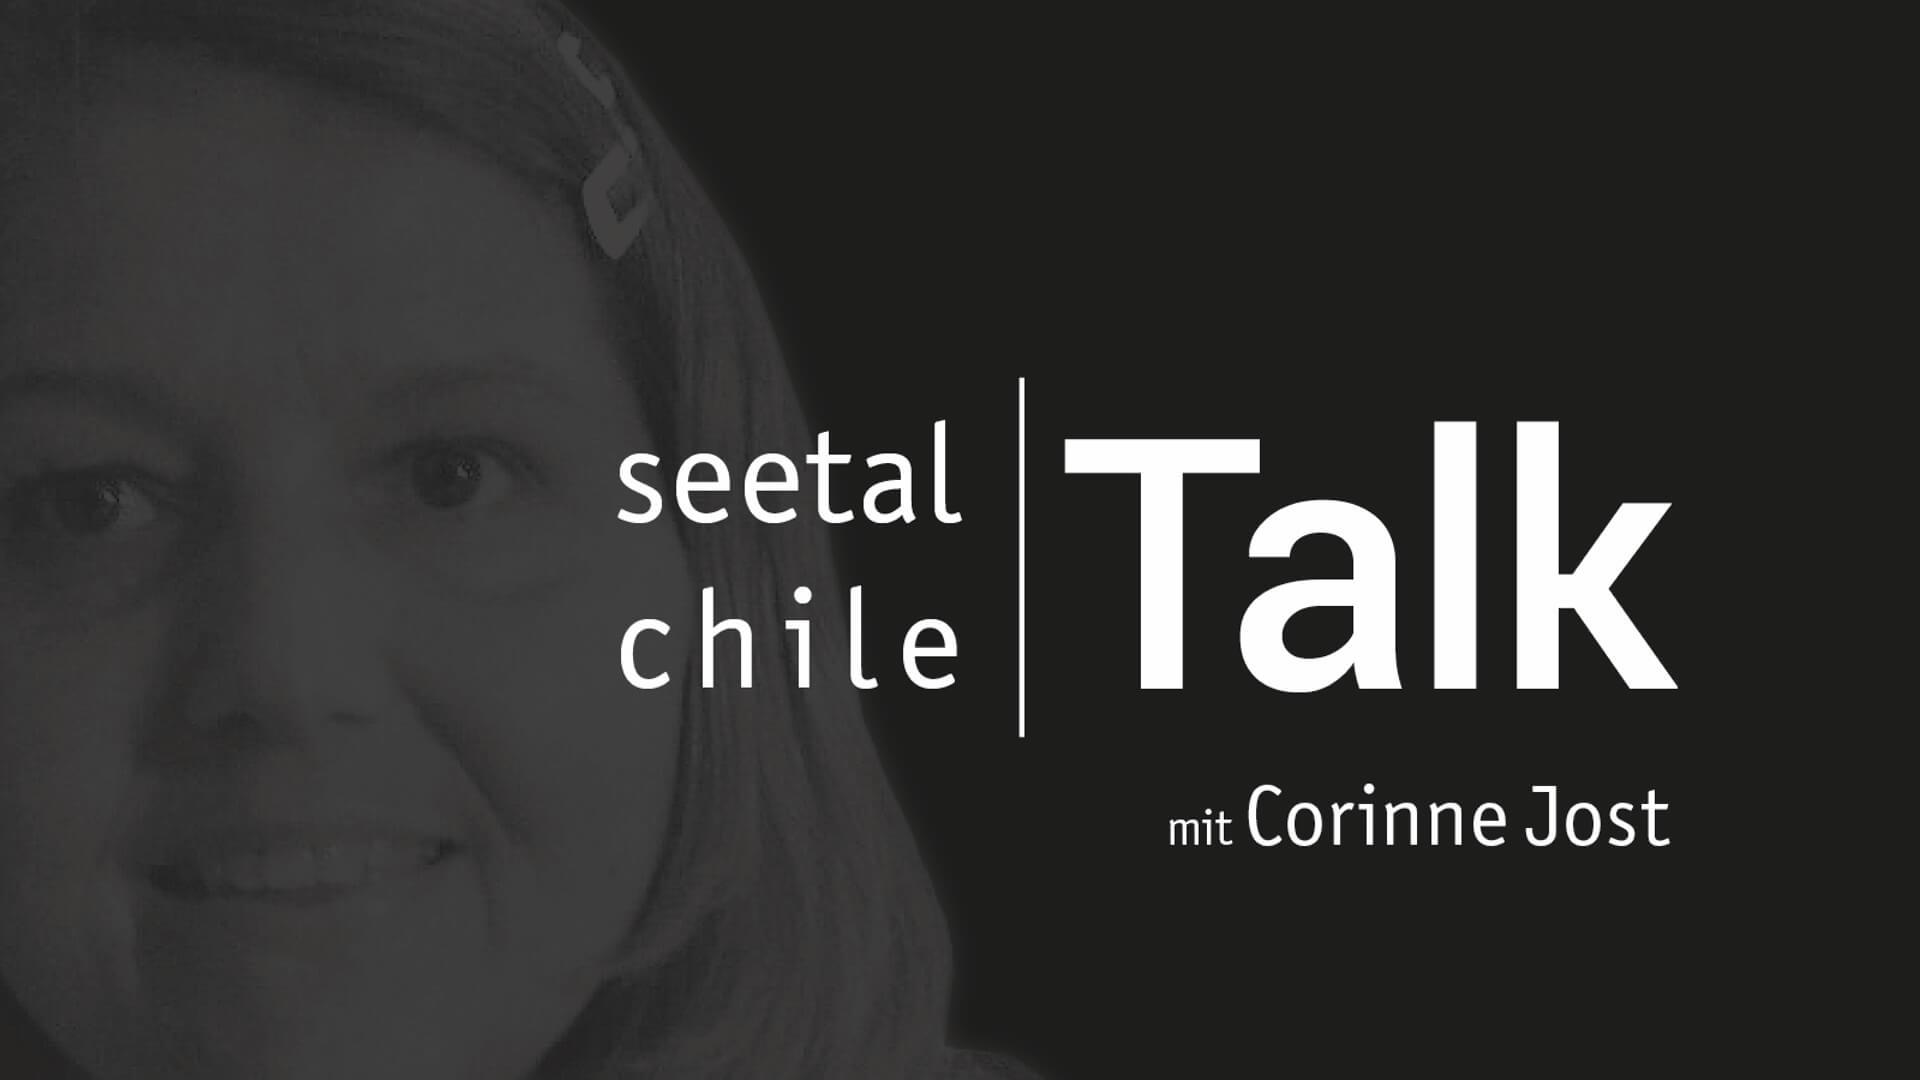 https://sermons.seetal-chile.ch/wp-content/uploads/sermons/2018/11/seetal-chile-Talk_Corinne-Jost.jpg